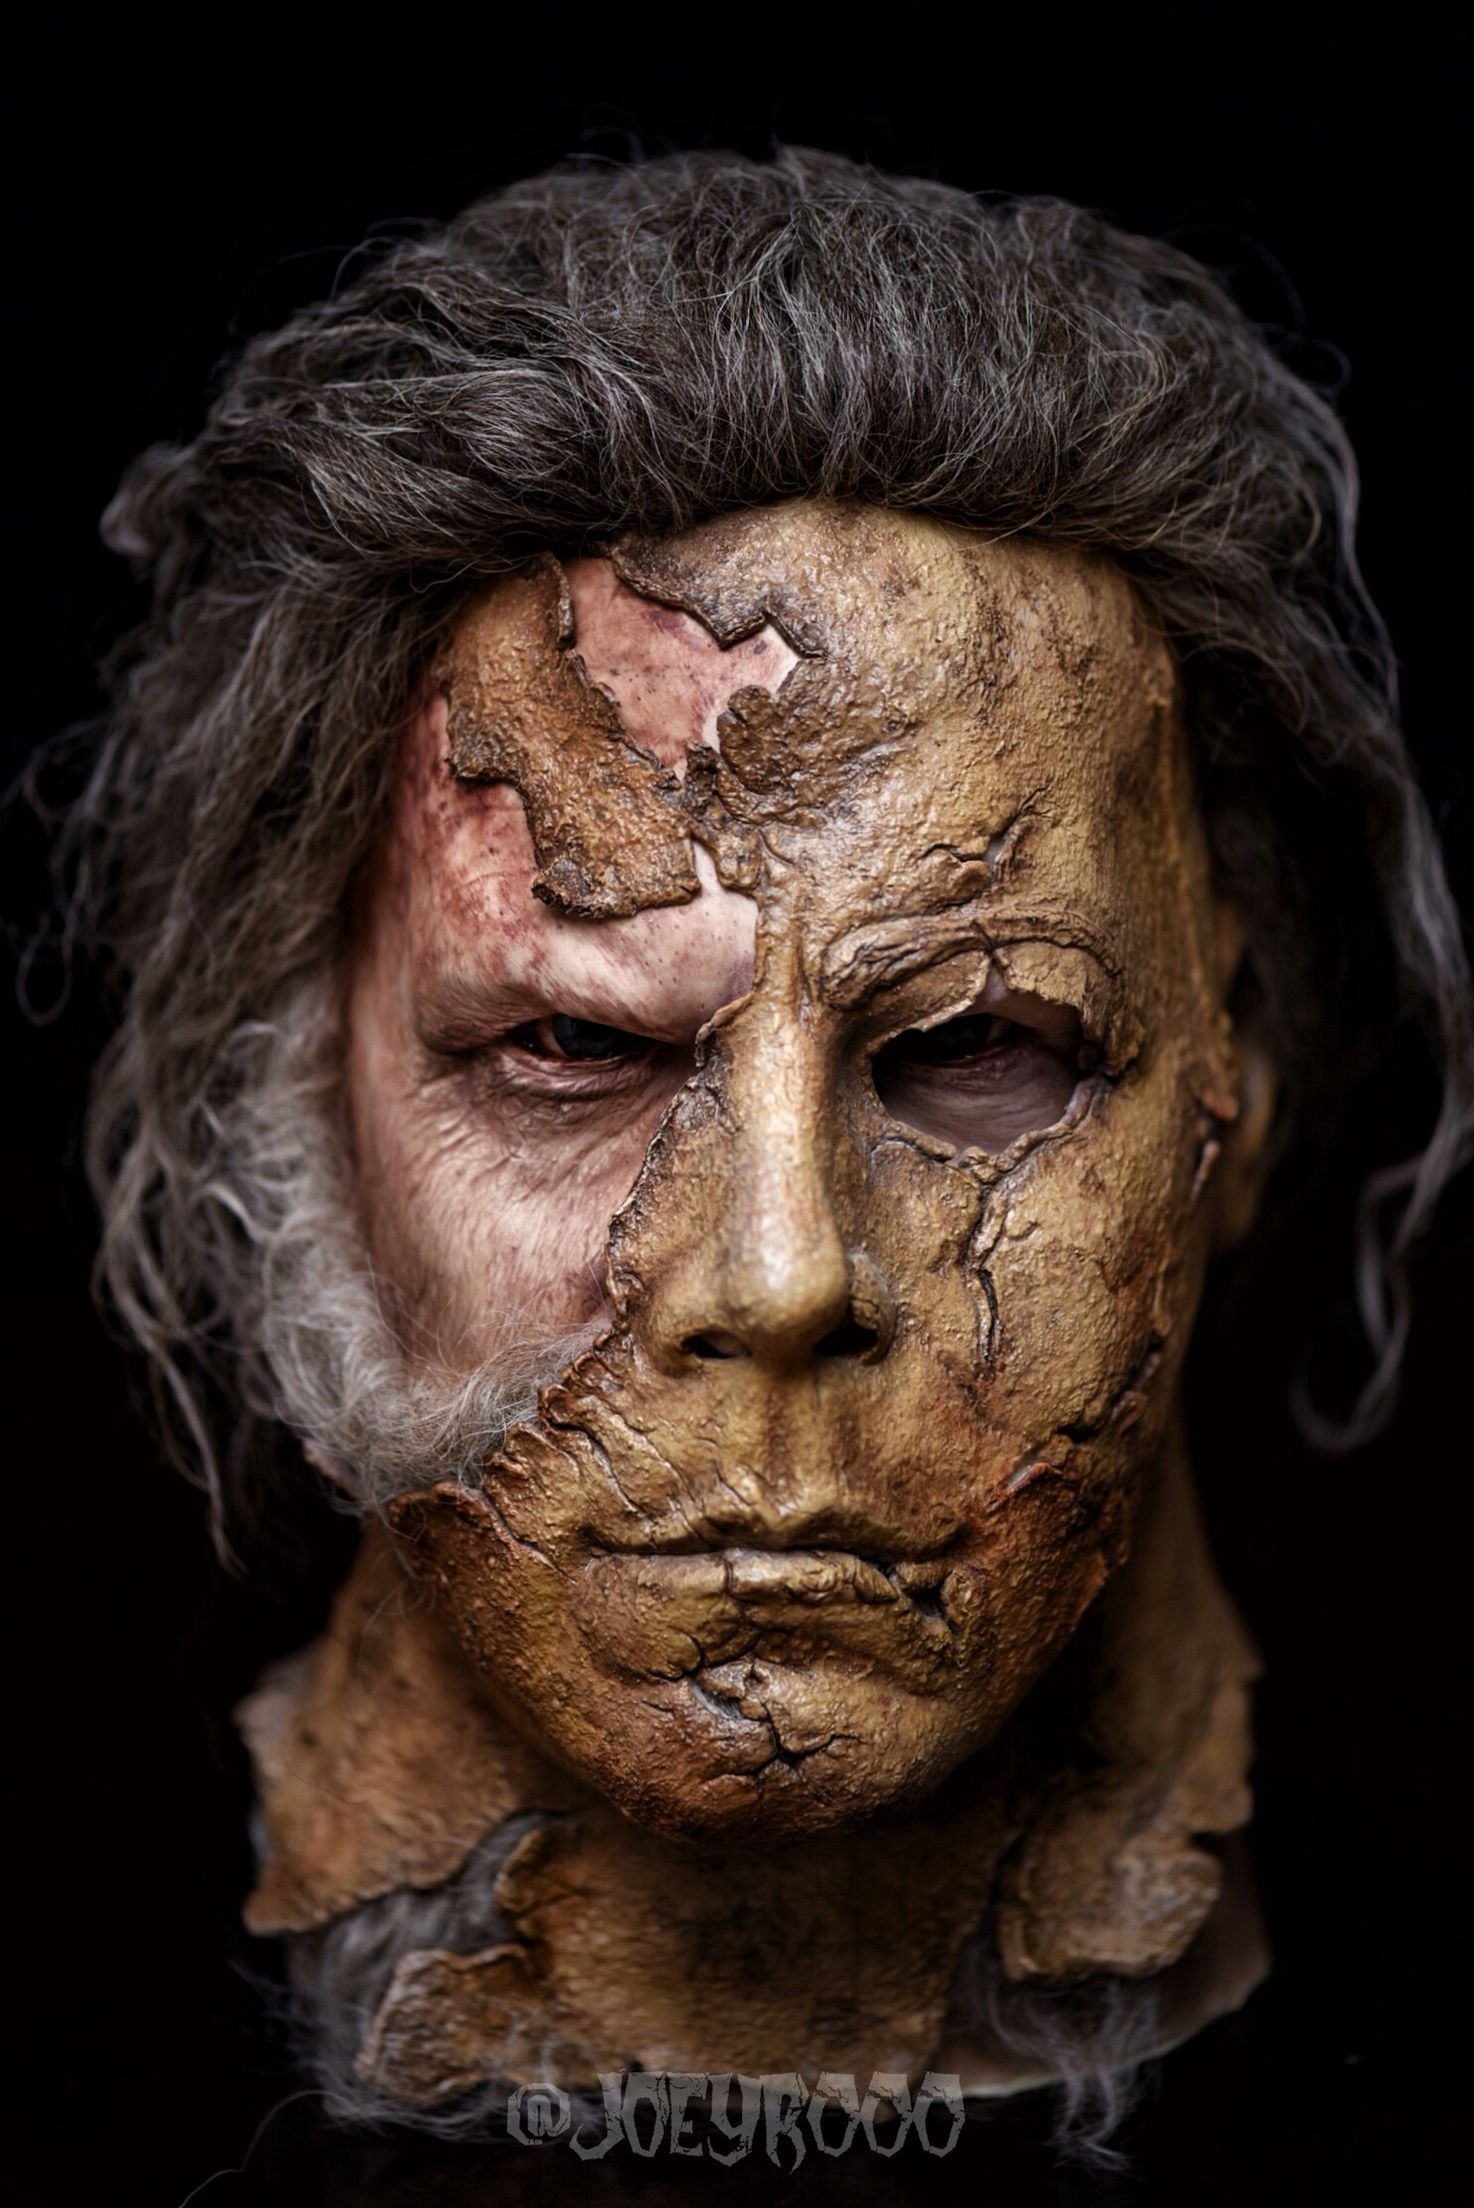 Halloween 2 Rob Zombie Mask.Dark Half Mask From Rob Zombie S Halloween 2 Photo Taken By